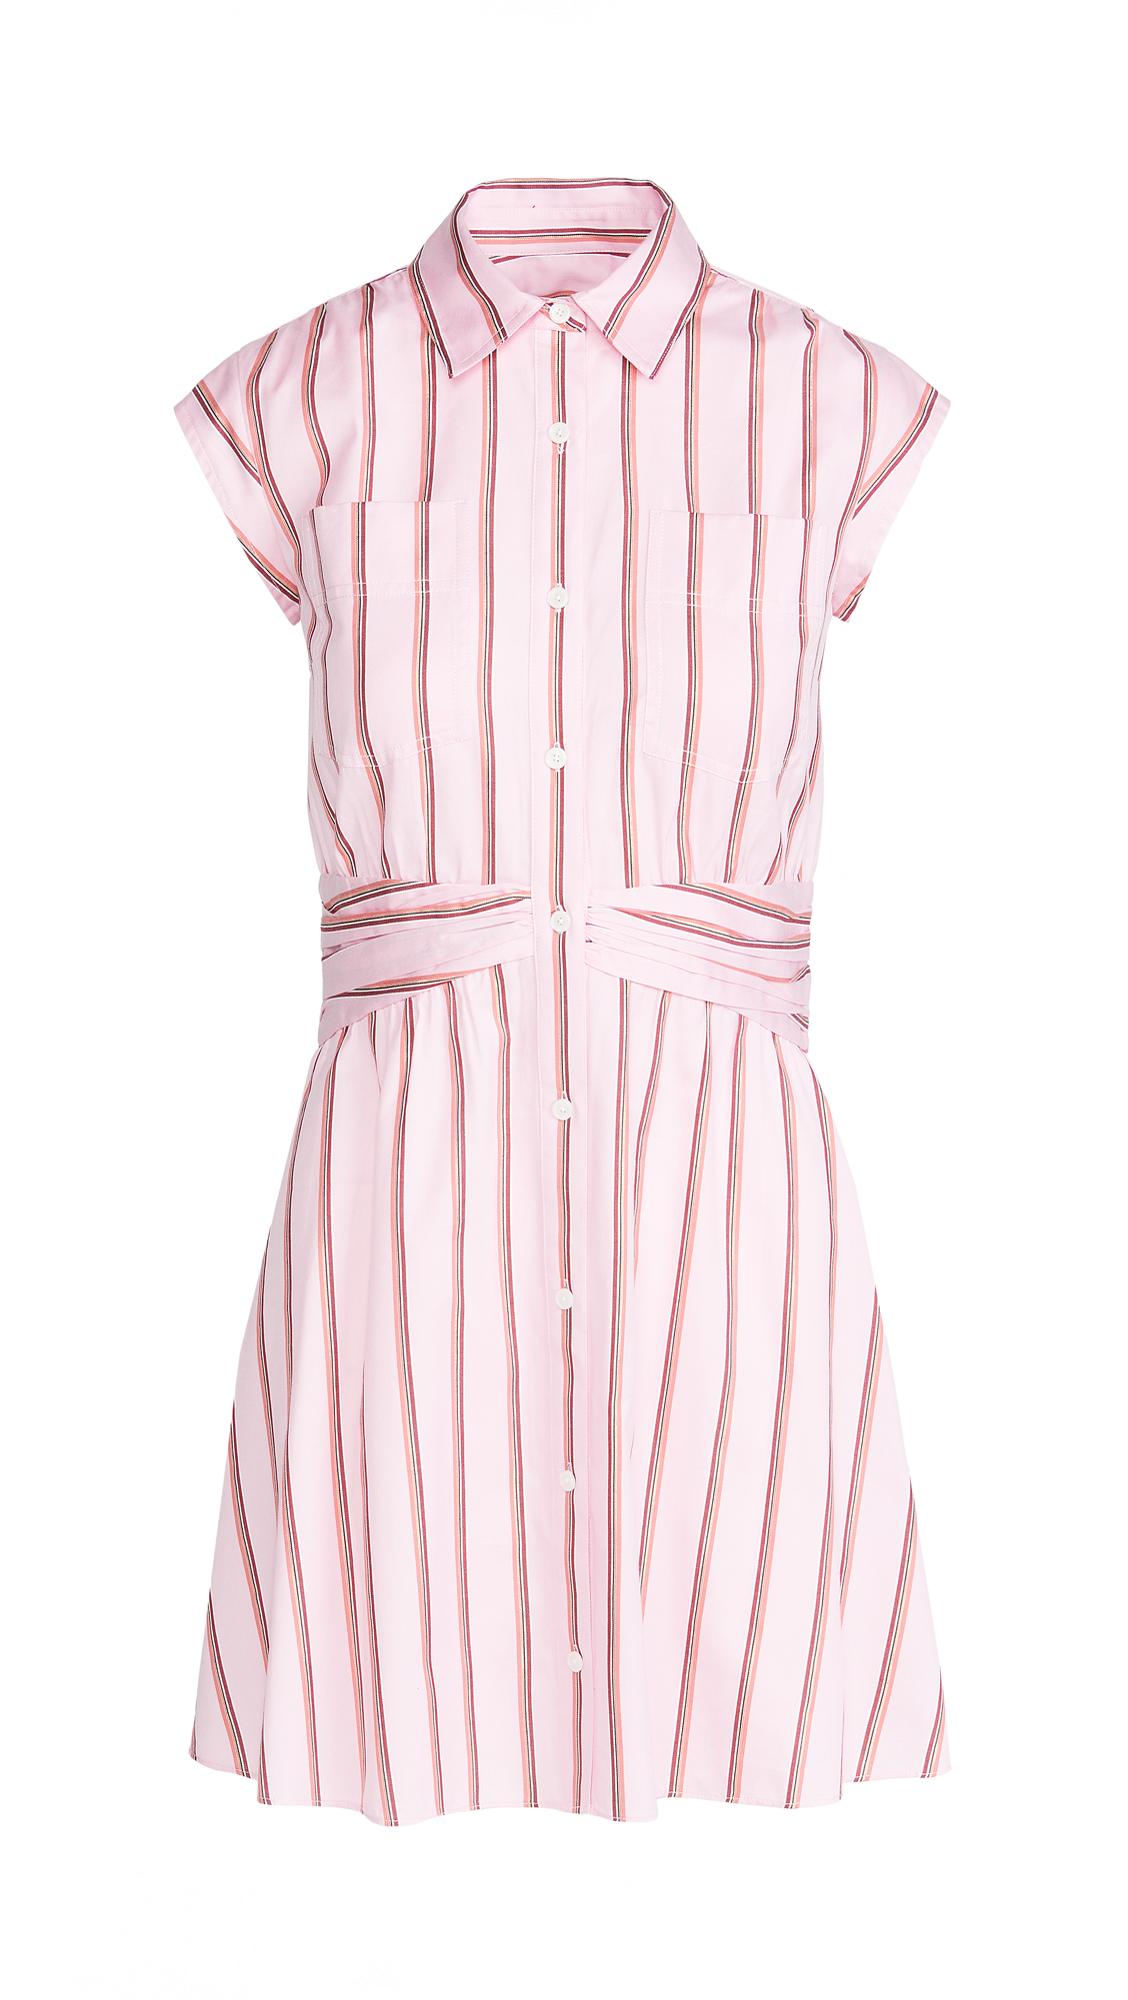 Derek Lam 10 Crosby Cora Shirt Dress